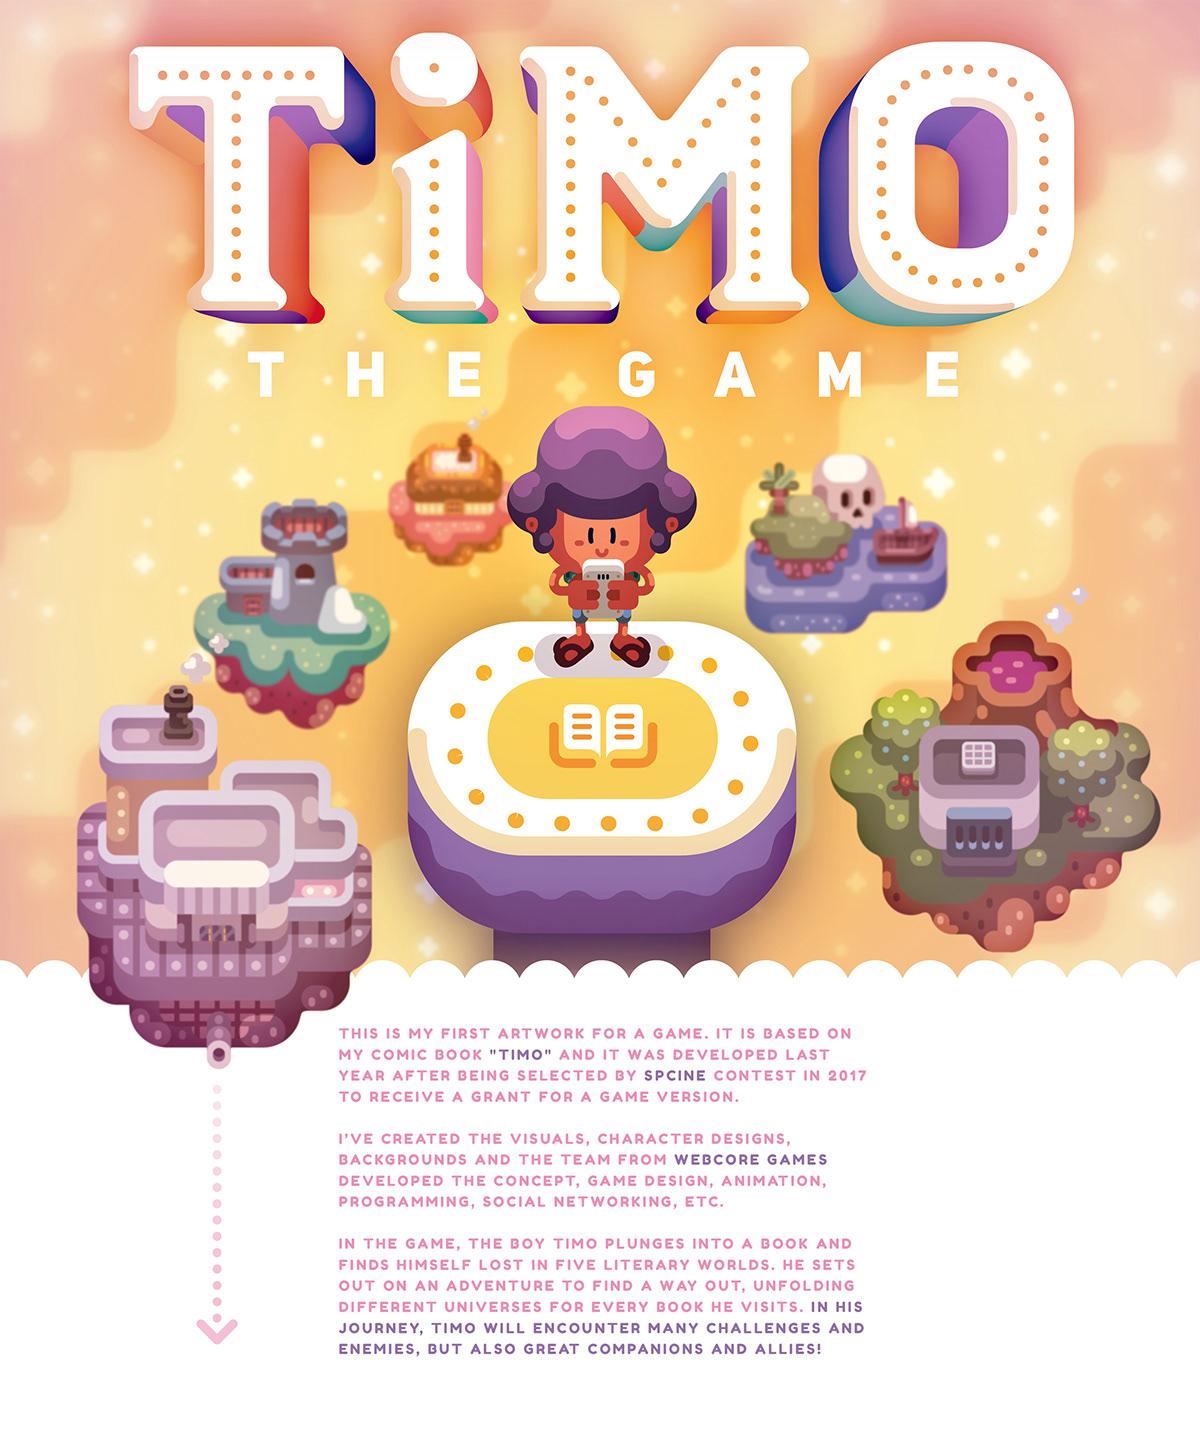 Games,apps,game design ,vector,kids,comics,videogame,indie,colors,ILLUSTRATION